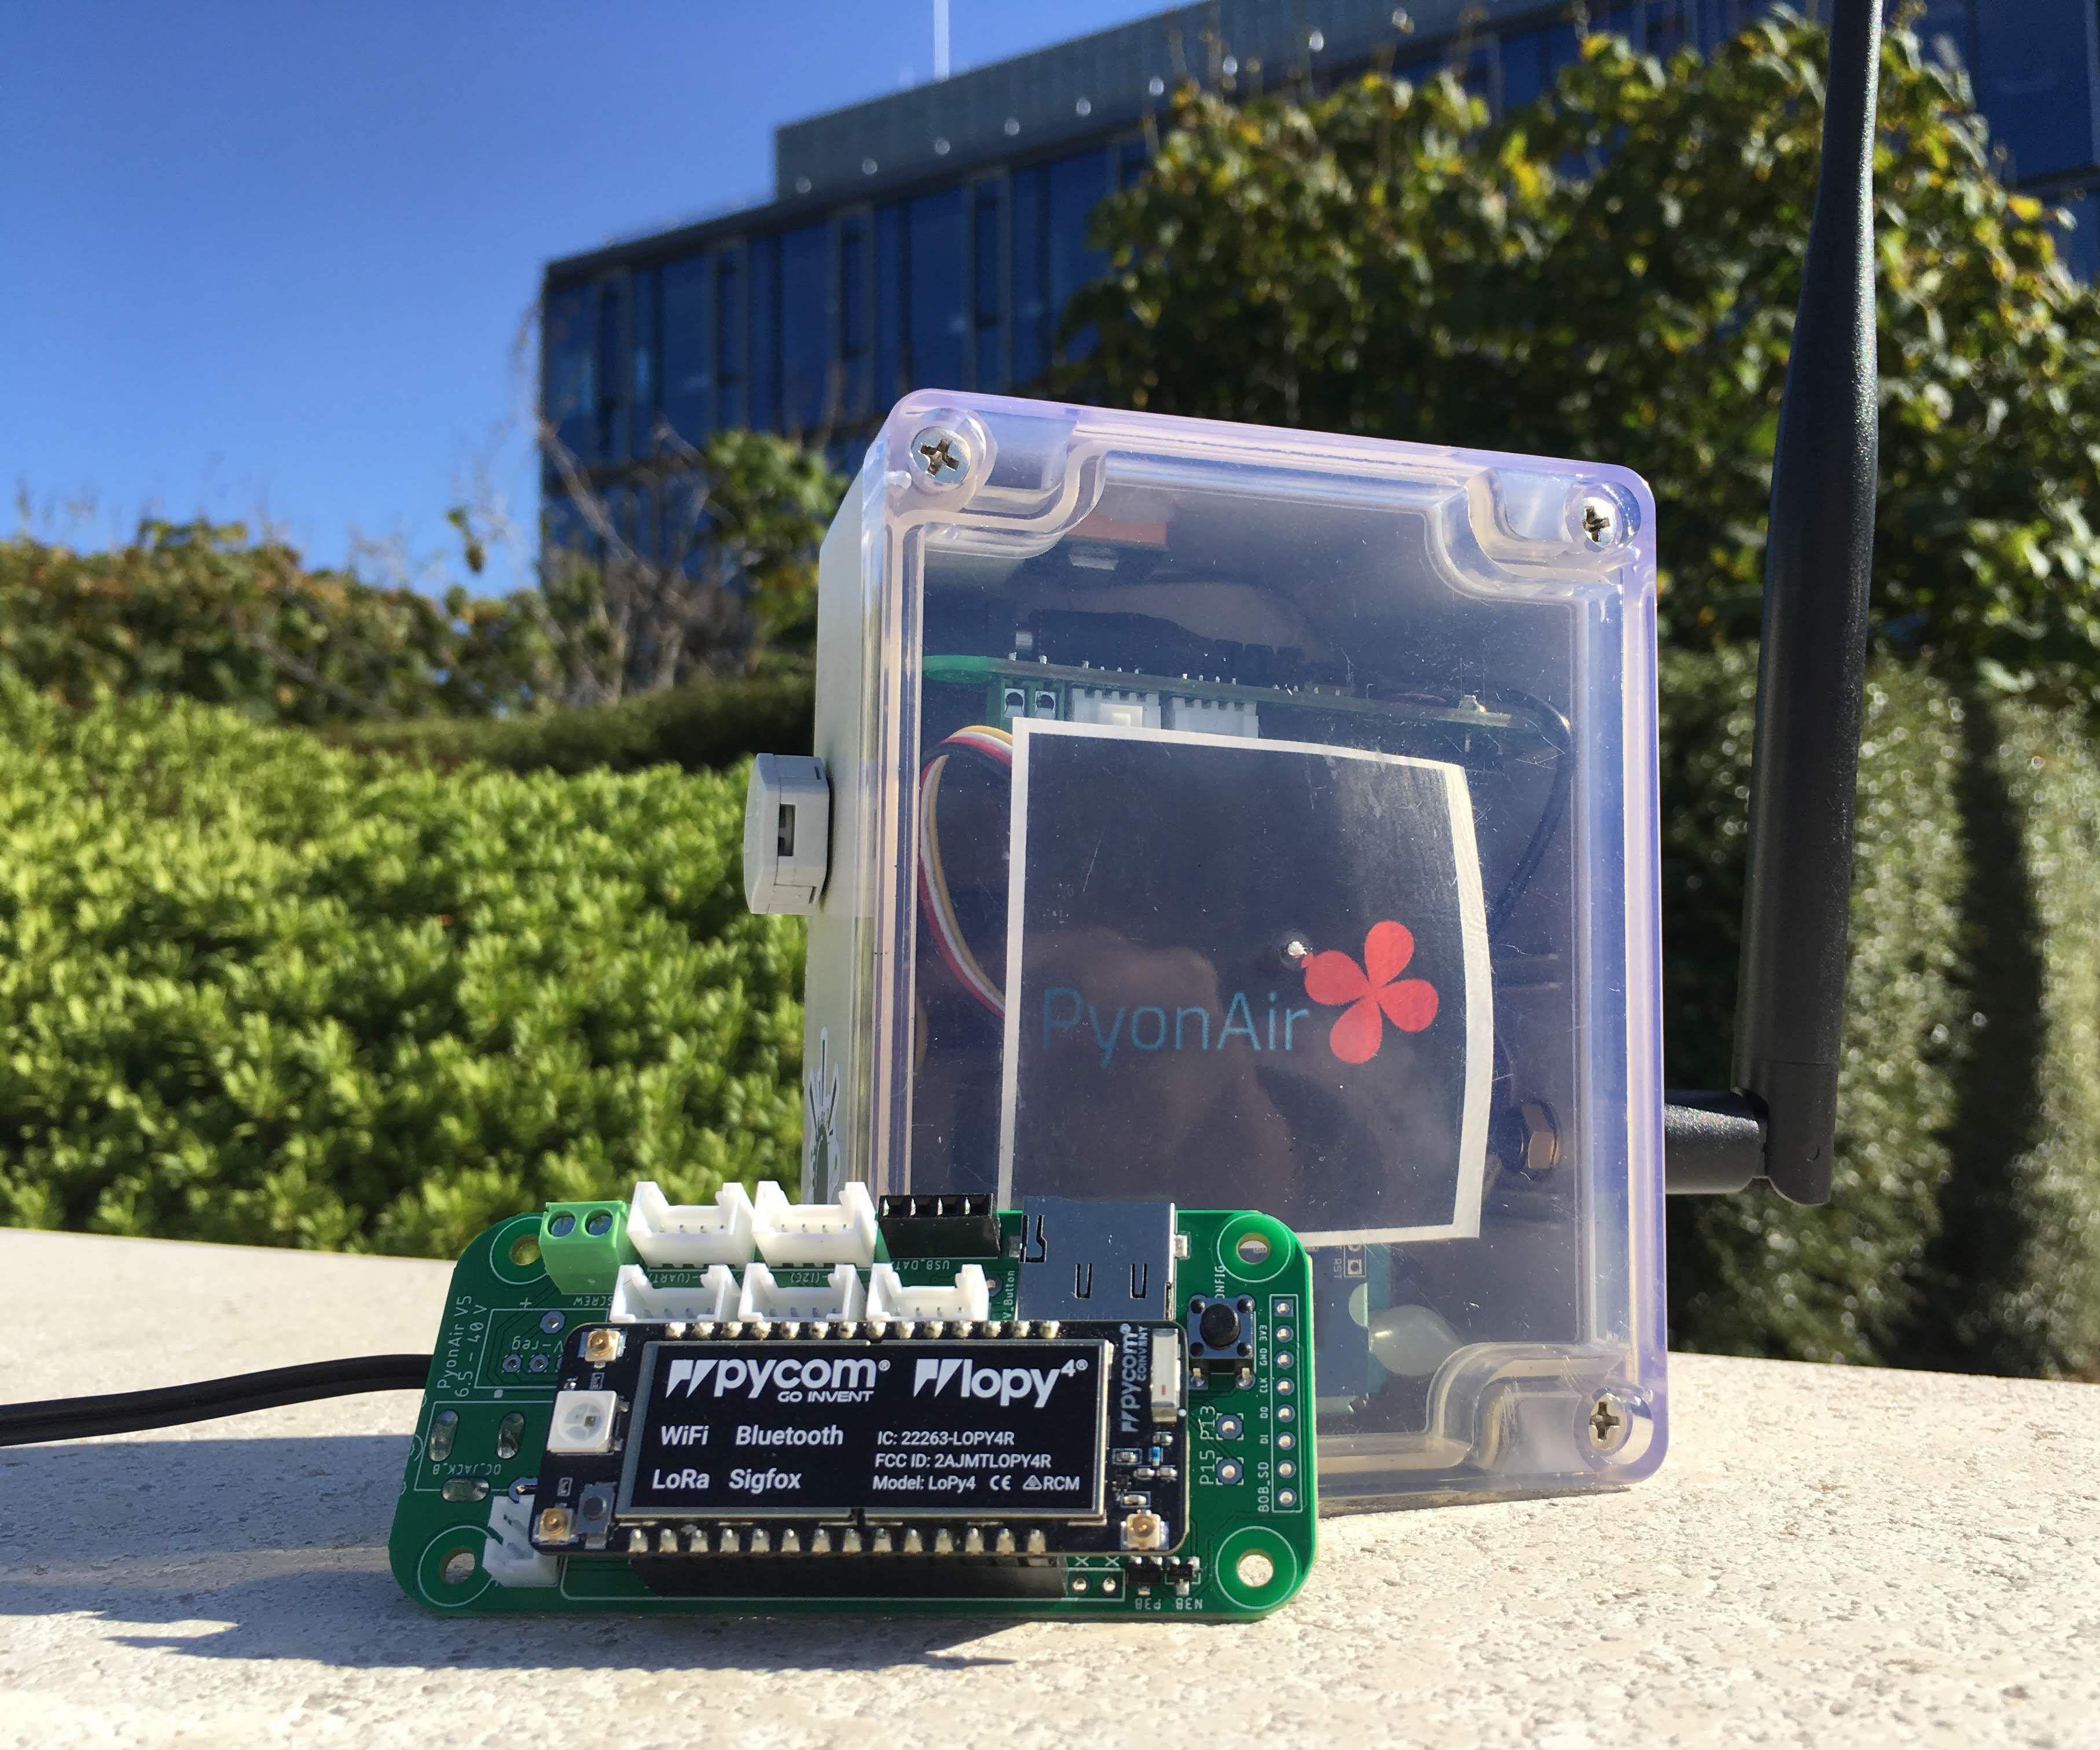 PyonAir - an Open Source Air Pollution Monitor